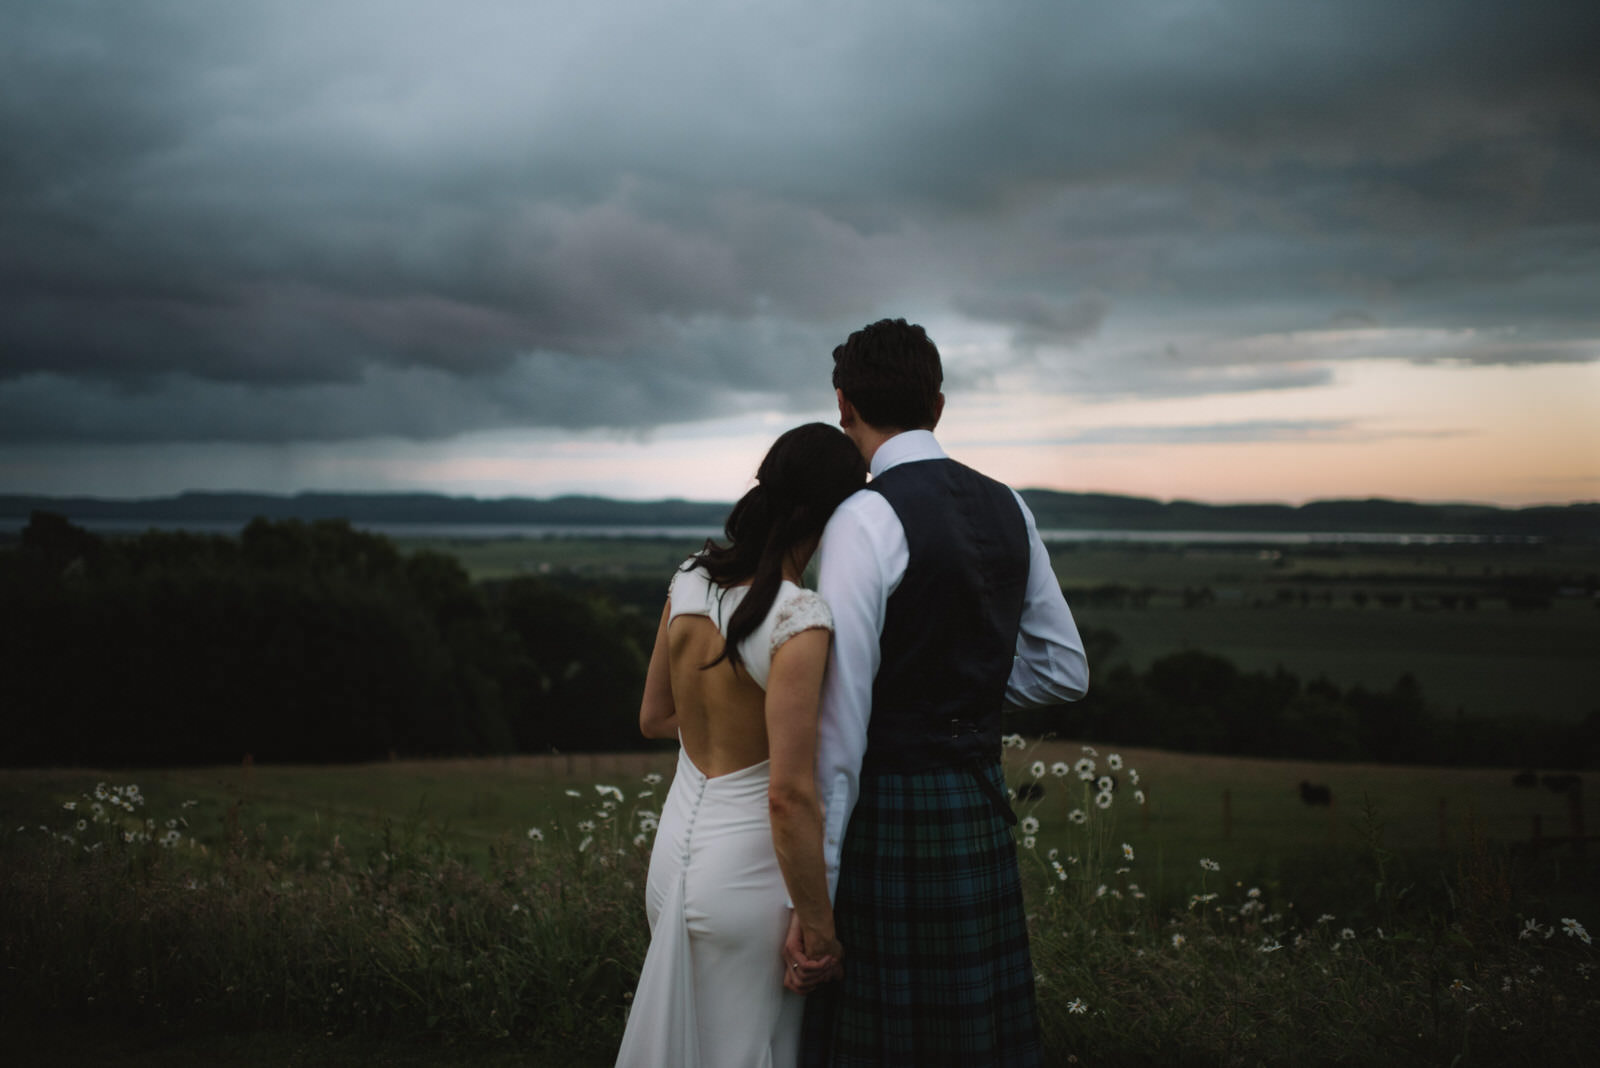 060-GUARDSWELL-FARM-WEDDING-ALTERNATIVE-SCOTTISH-WEDDING-PHOTOGRAPHER-SCOTTISH-WEDDING-DESTINATION-WEDDING-PHOTOGRAPHER.JPG